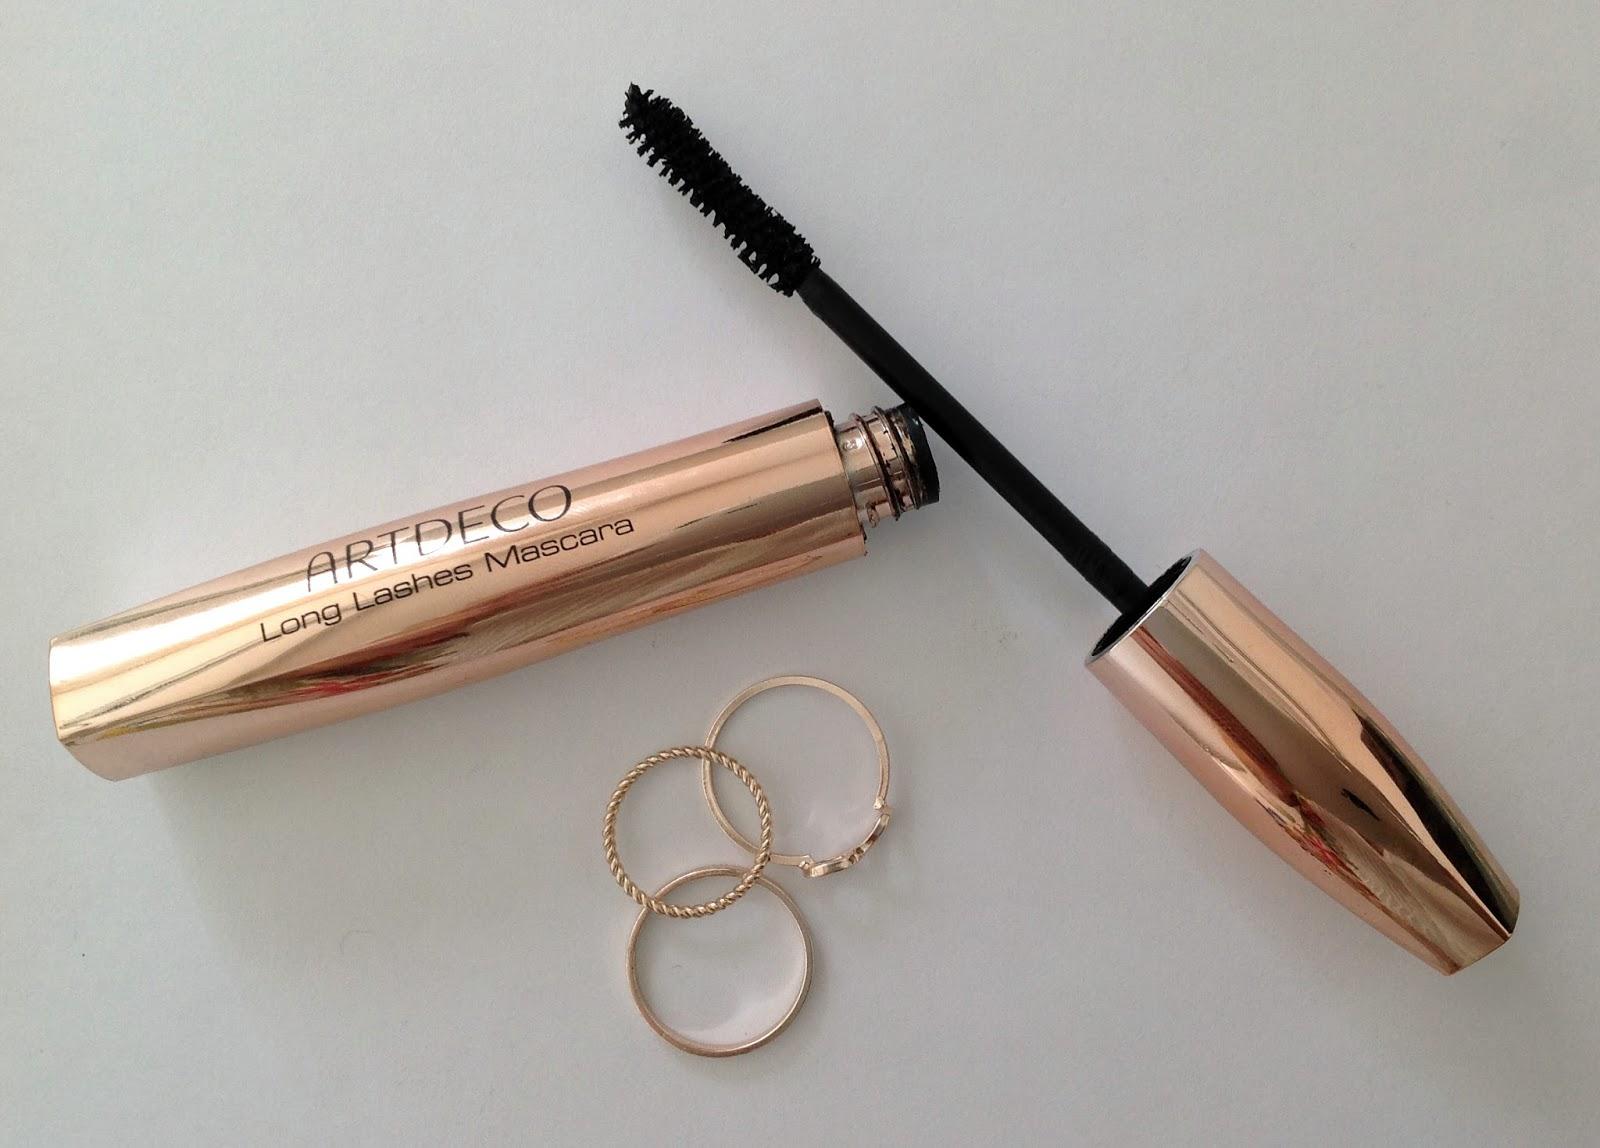 Artdeco Long Lashes mascara – low maintenance beauty